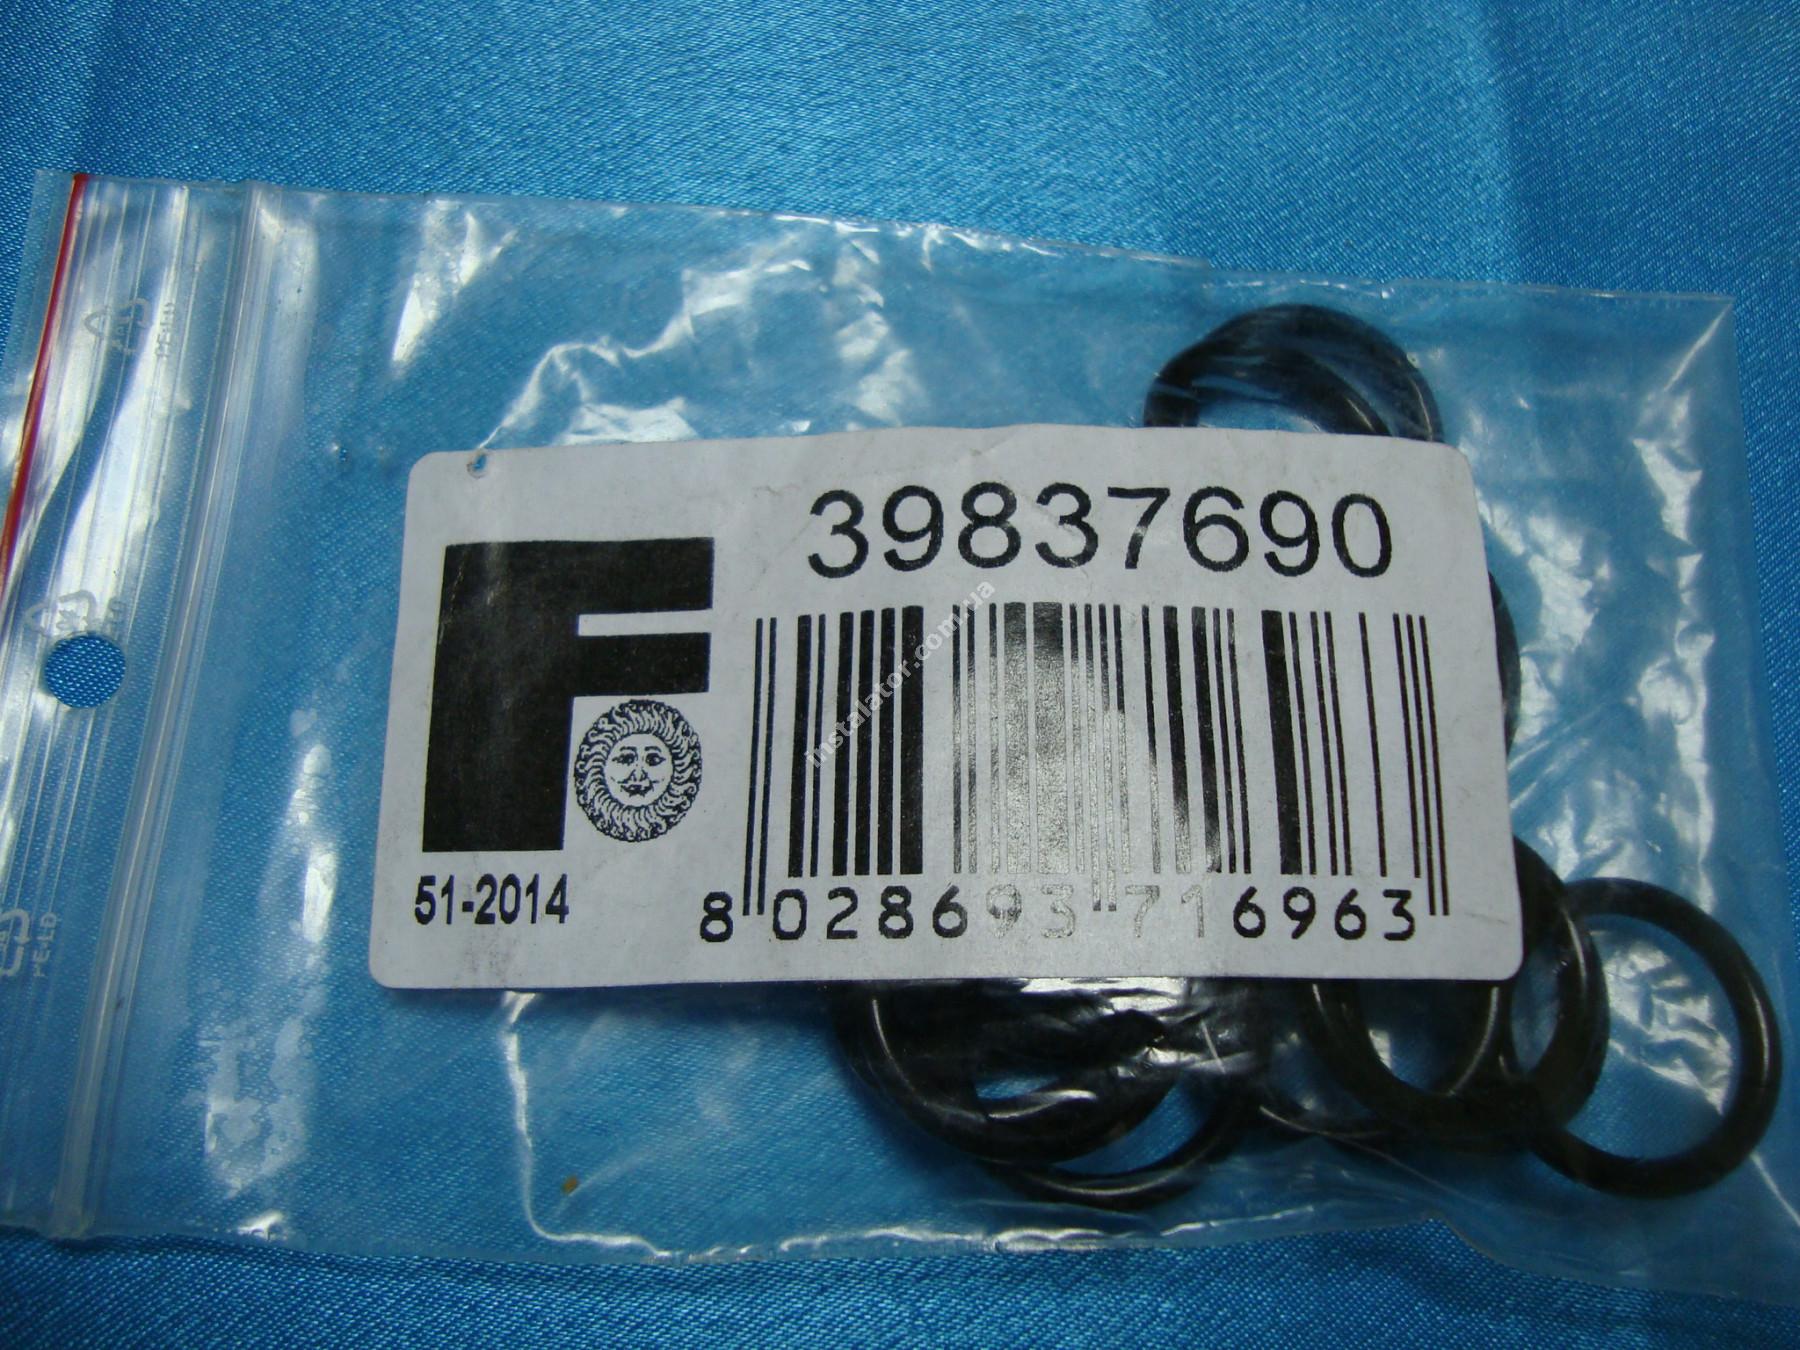 398376900 Сальник теплообмінника FERROLI Domiproject, Domina, Fereasy full-image-0